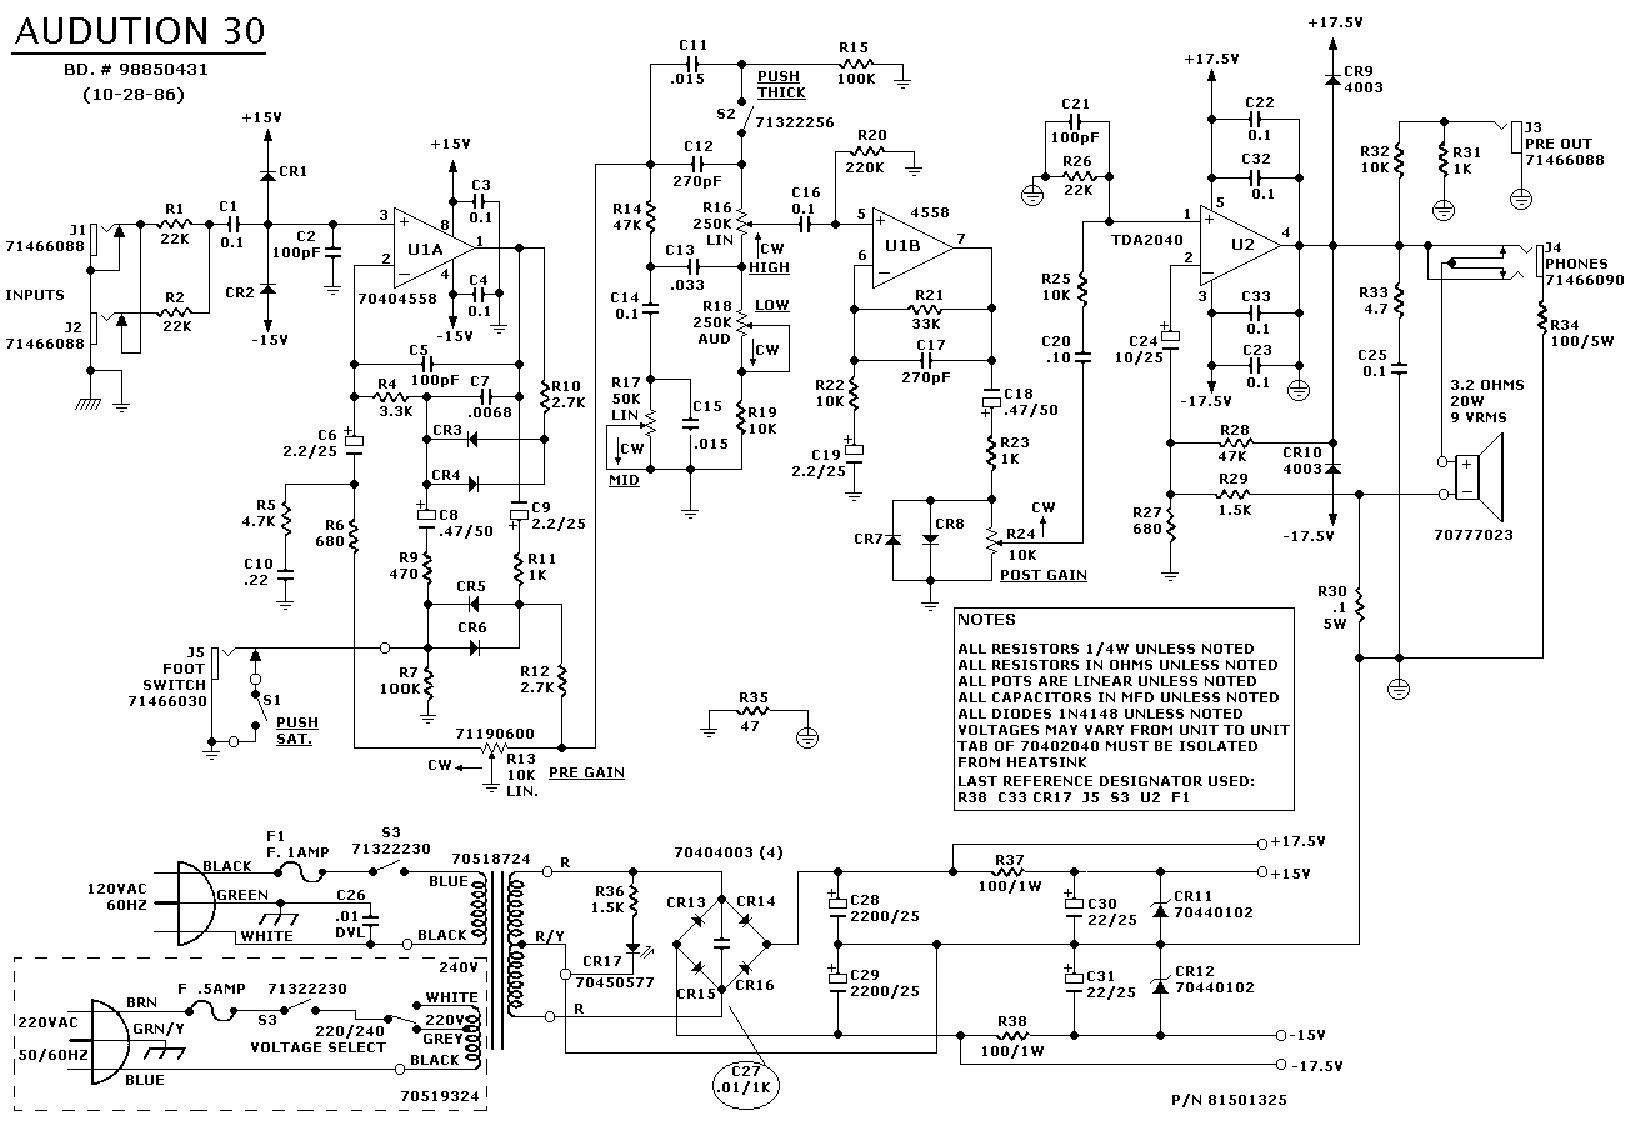 Peavey Classic 30 Sch Service Manual Download Schematics